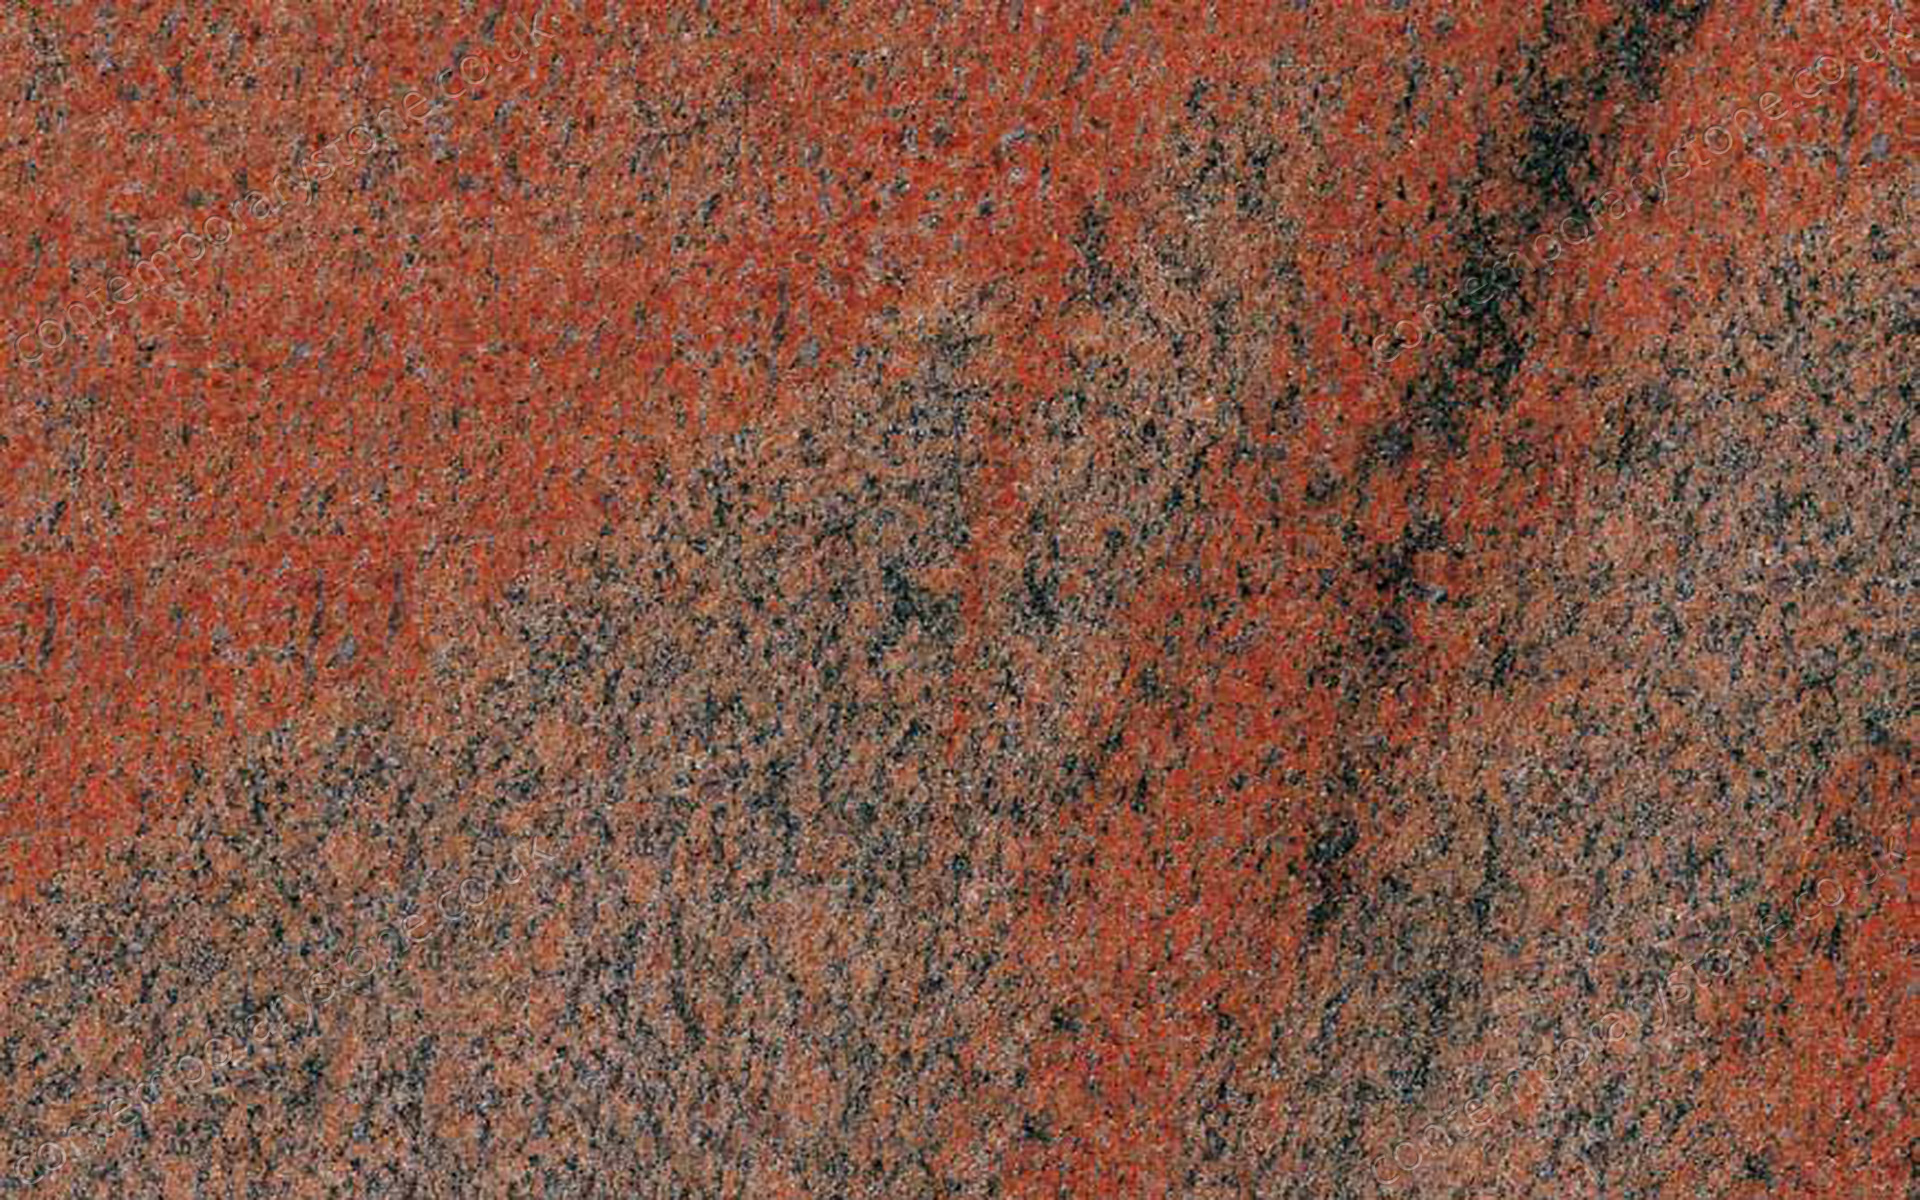 Multicolor Red granite close-up